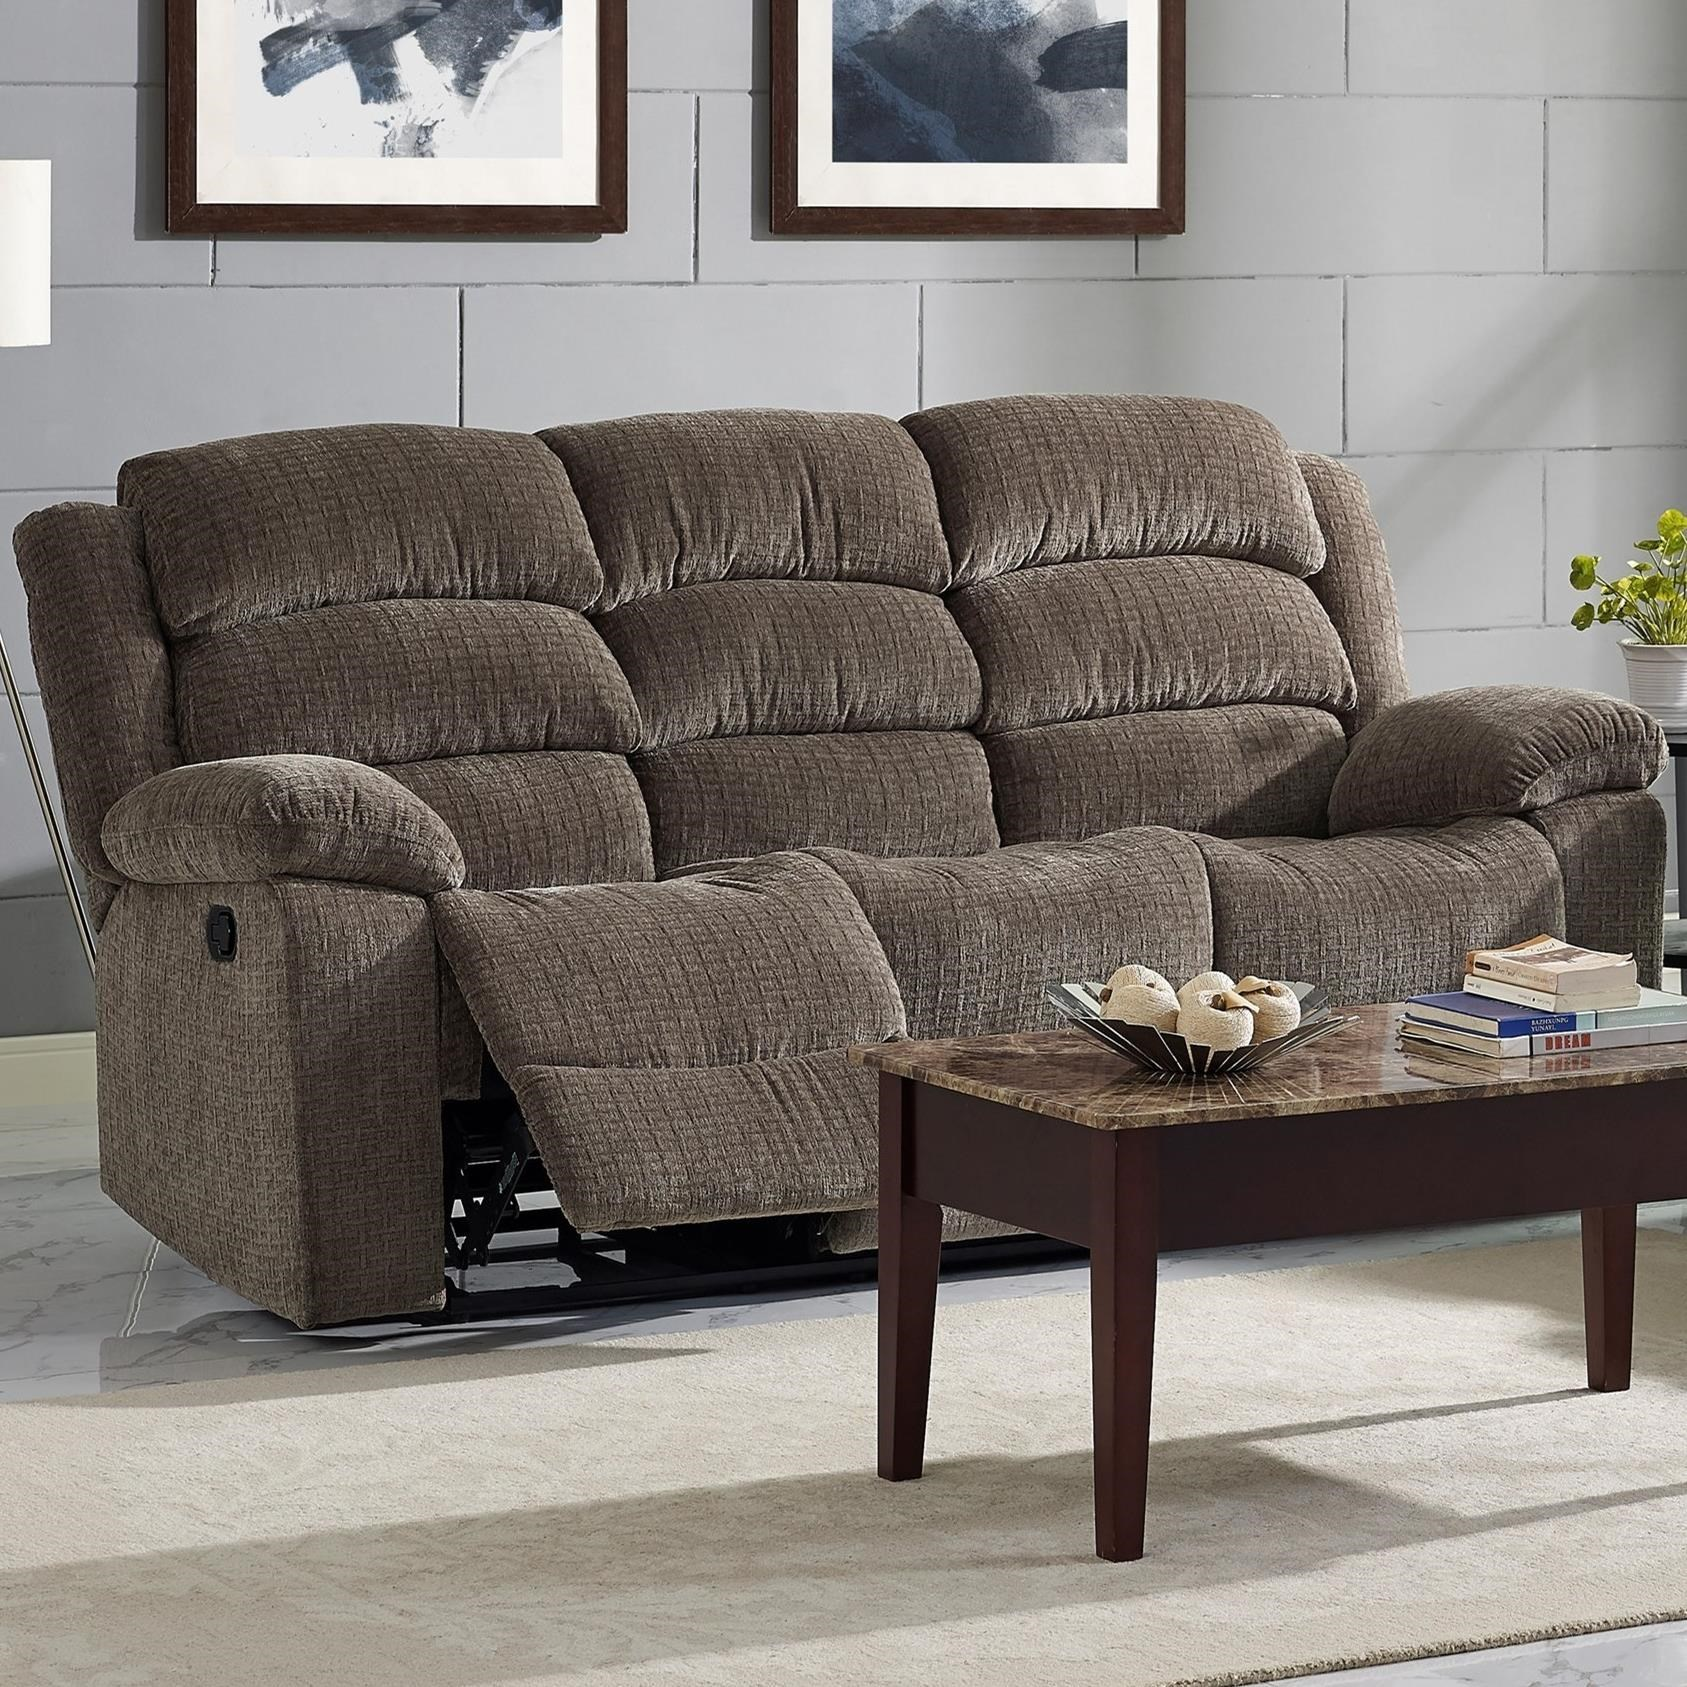 Merveilleux New Classic AustinReclining Sofa